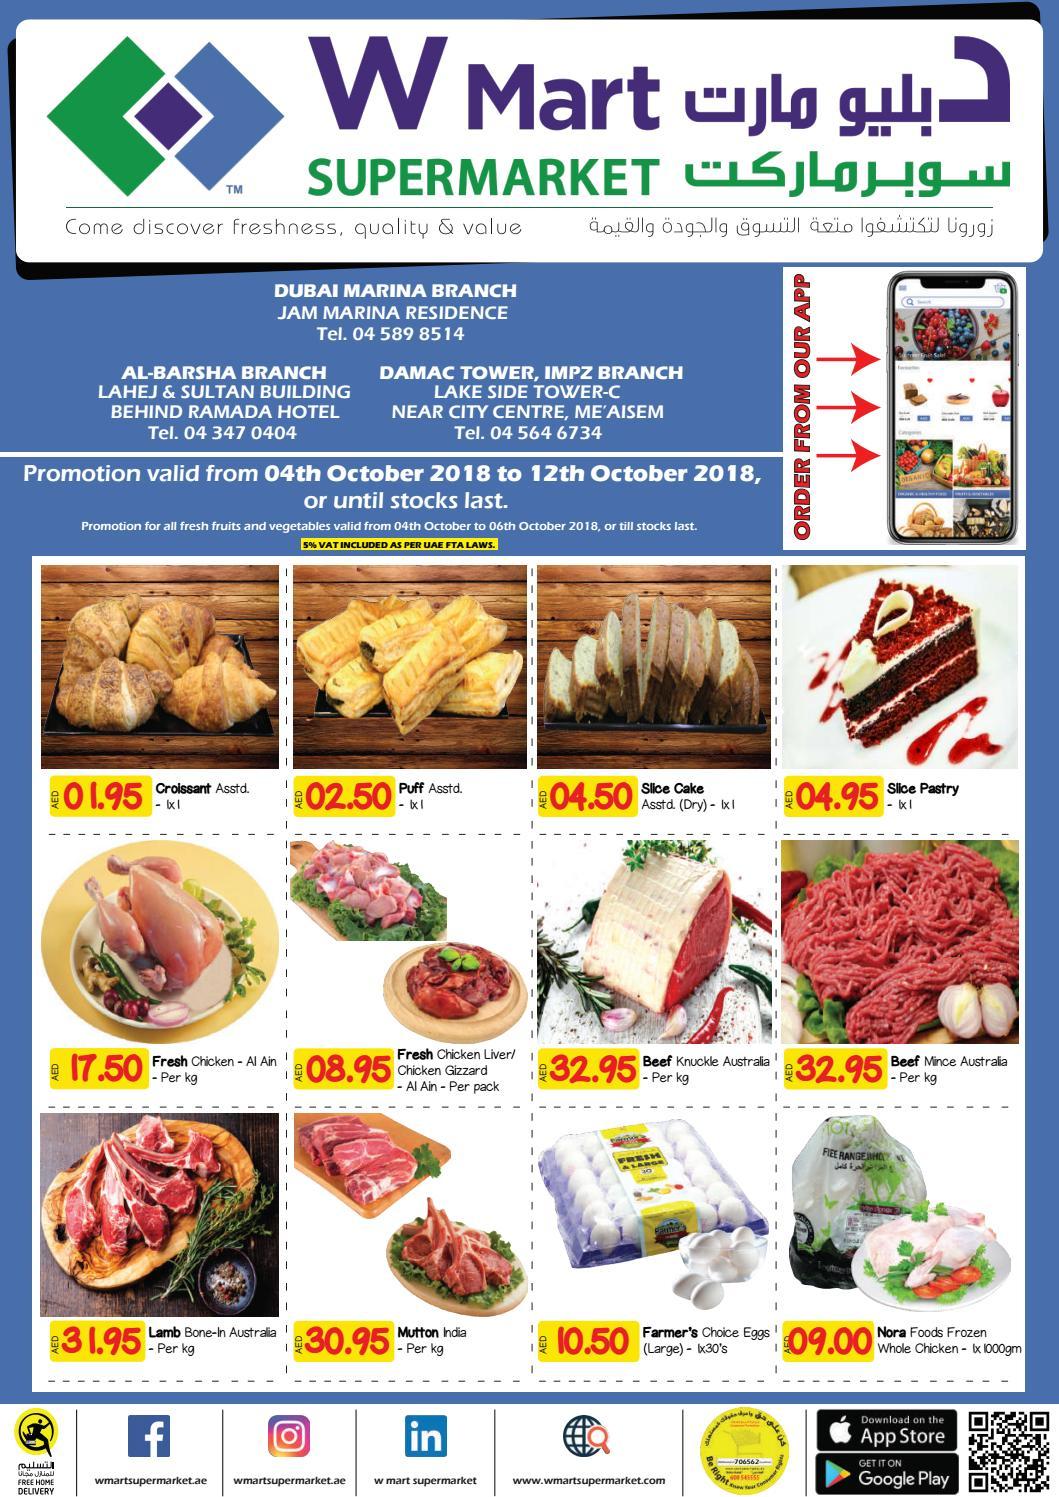 www shoppinginformer com by Shopping Informer - issuu